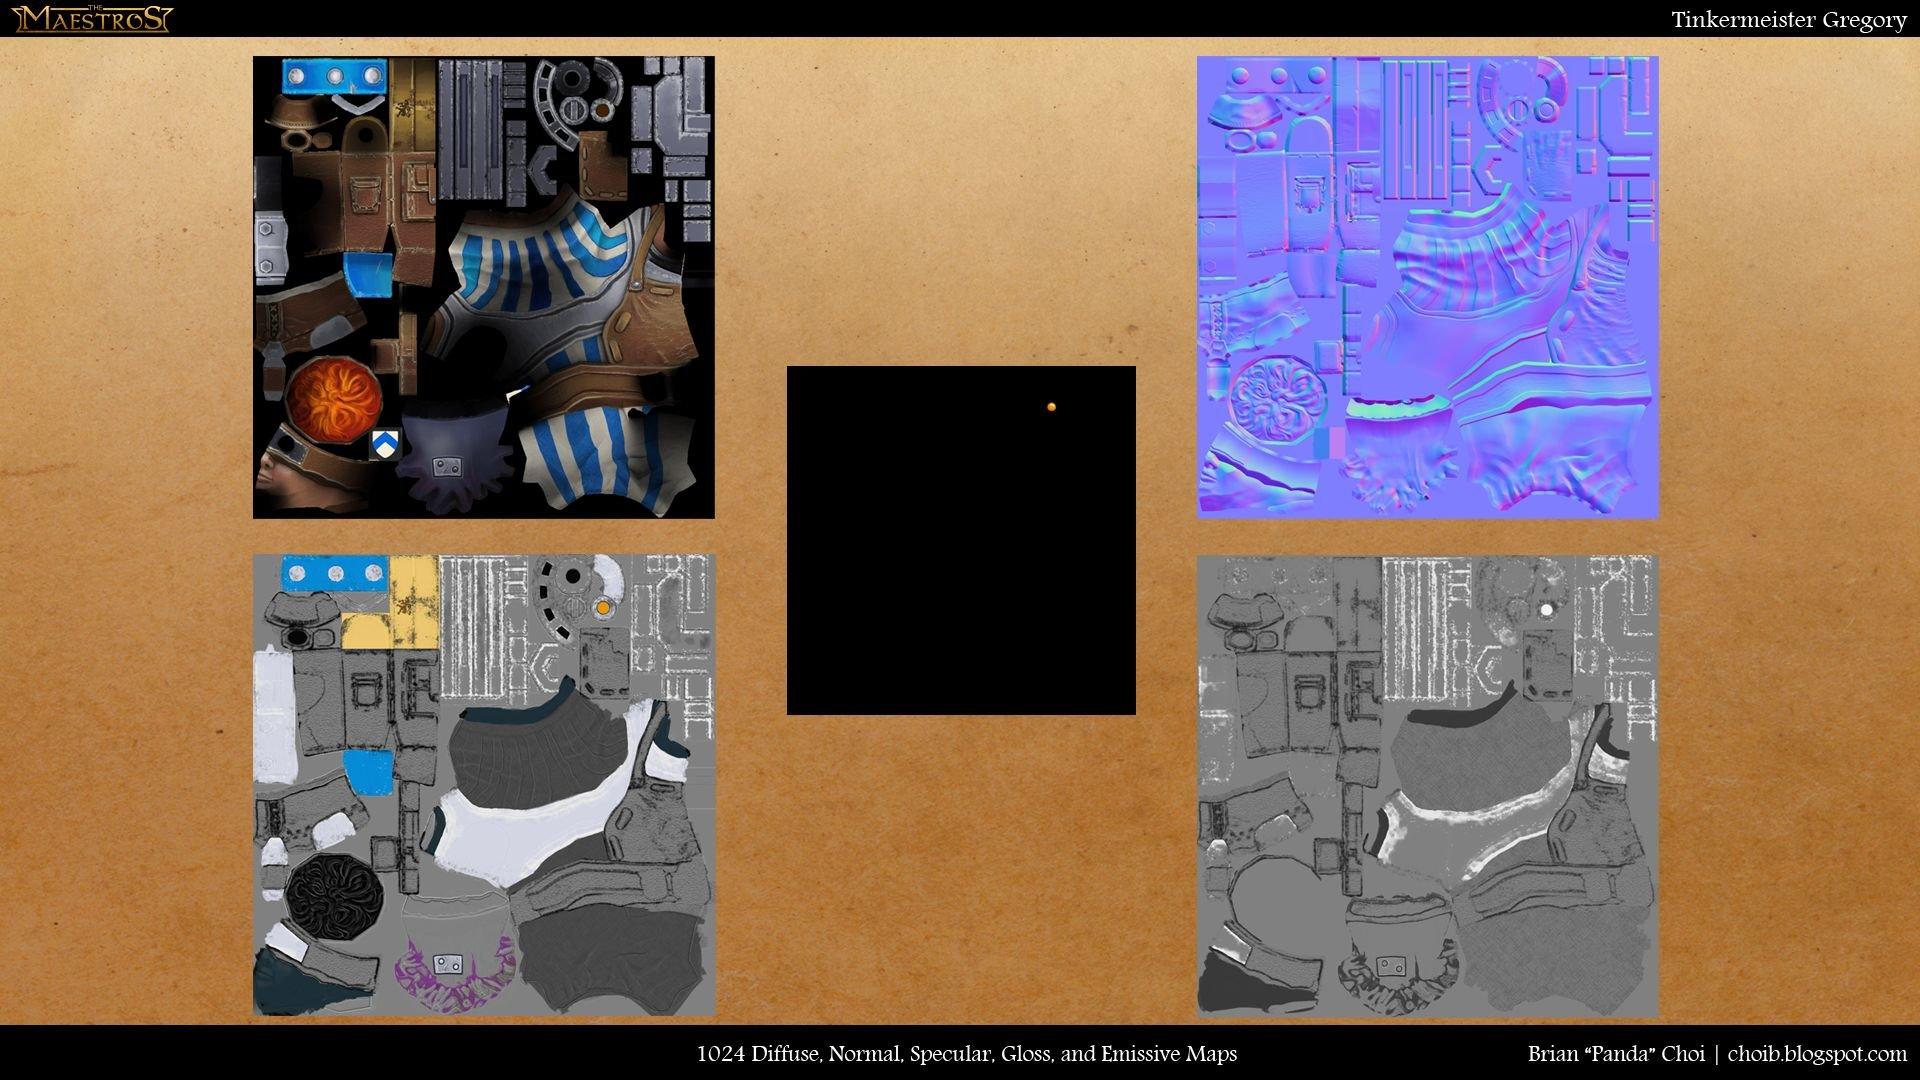 Brian choi tinkermeistergregory texturemaps